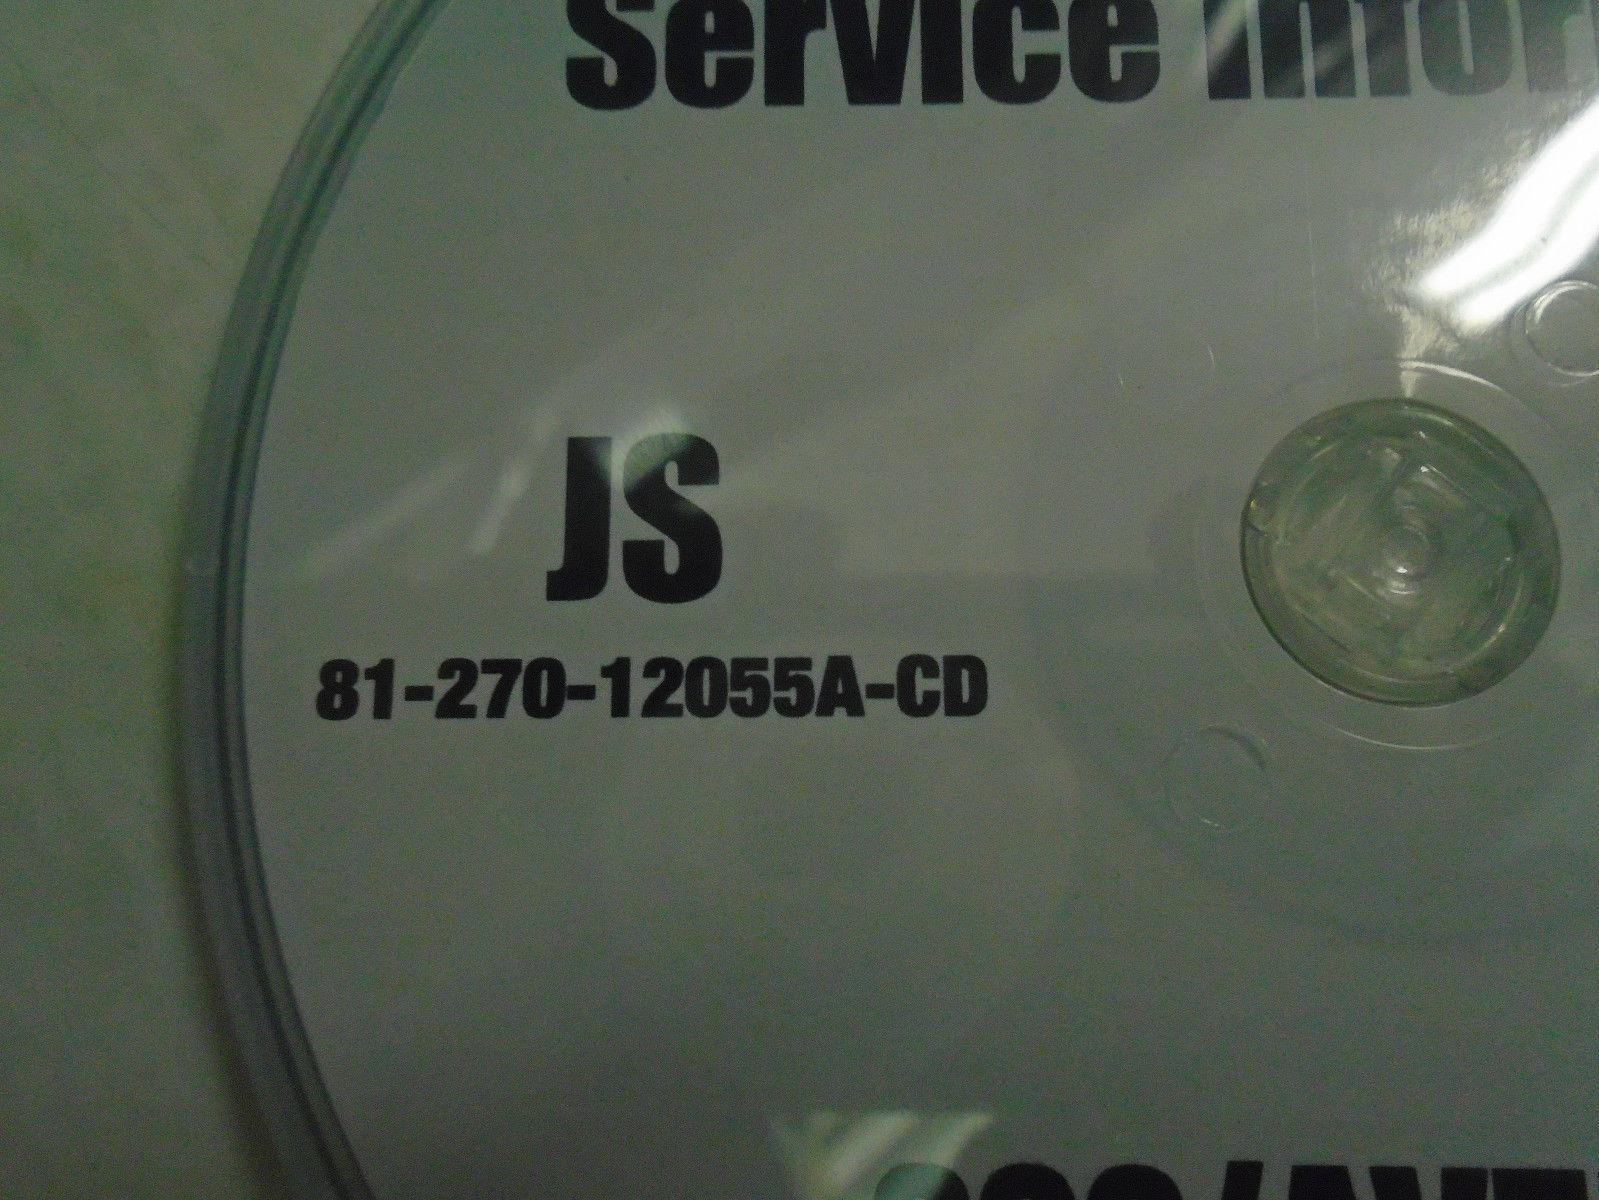 2012 DODGE AVENGER Service Shop Repair Manual CD DVD DEALERSHIP BRAND NEW 2012